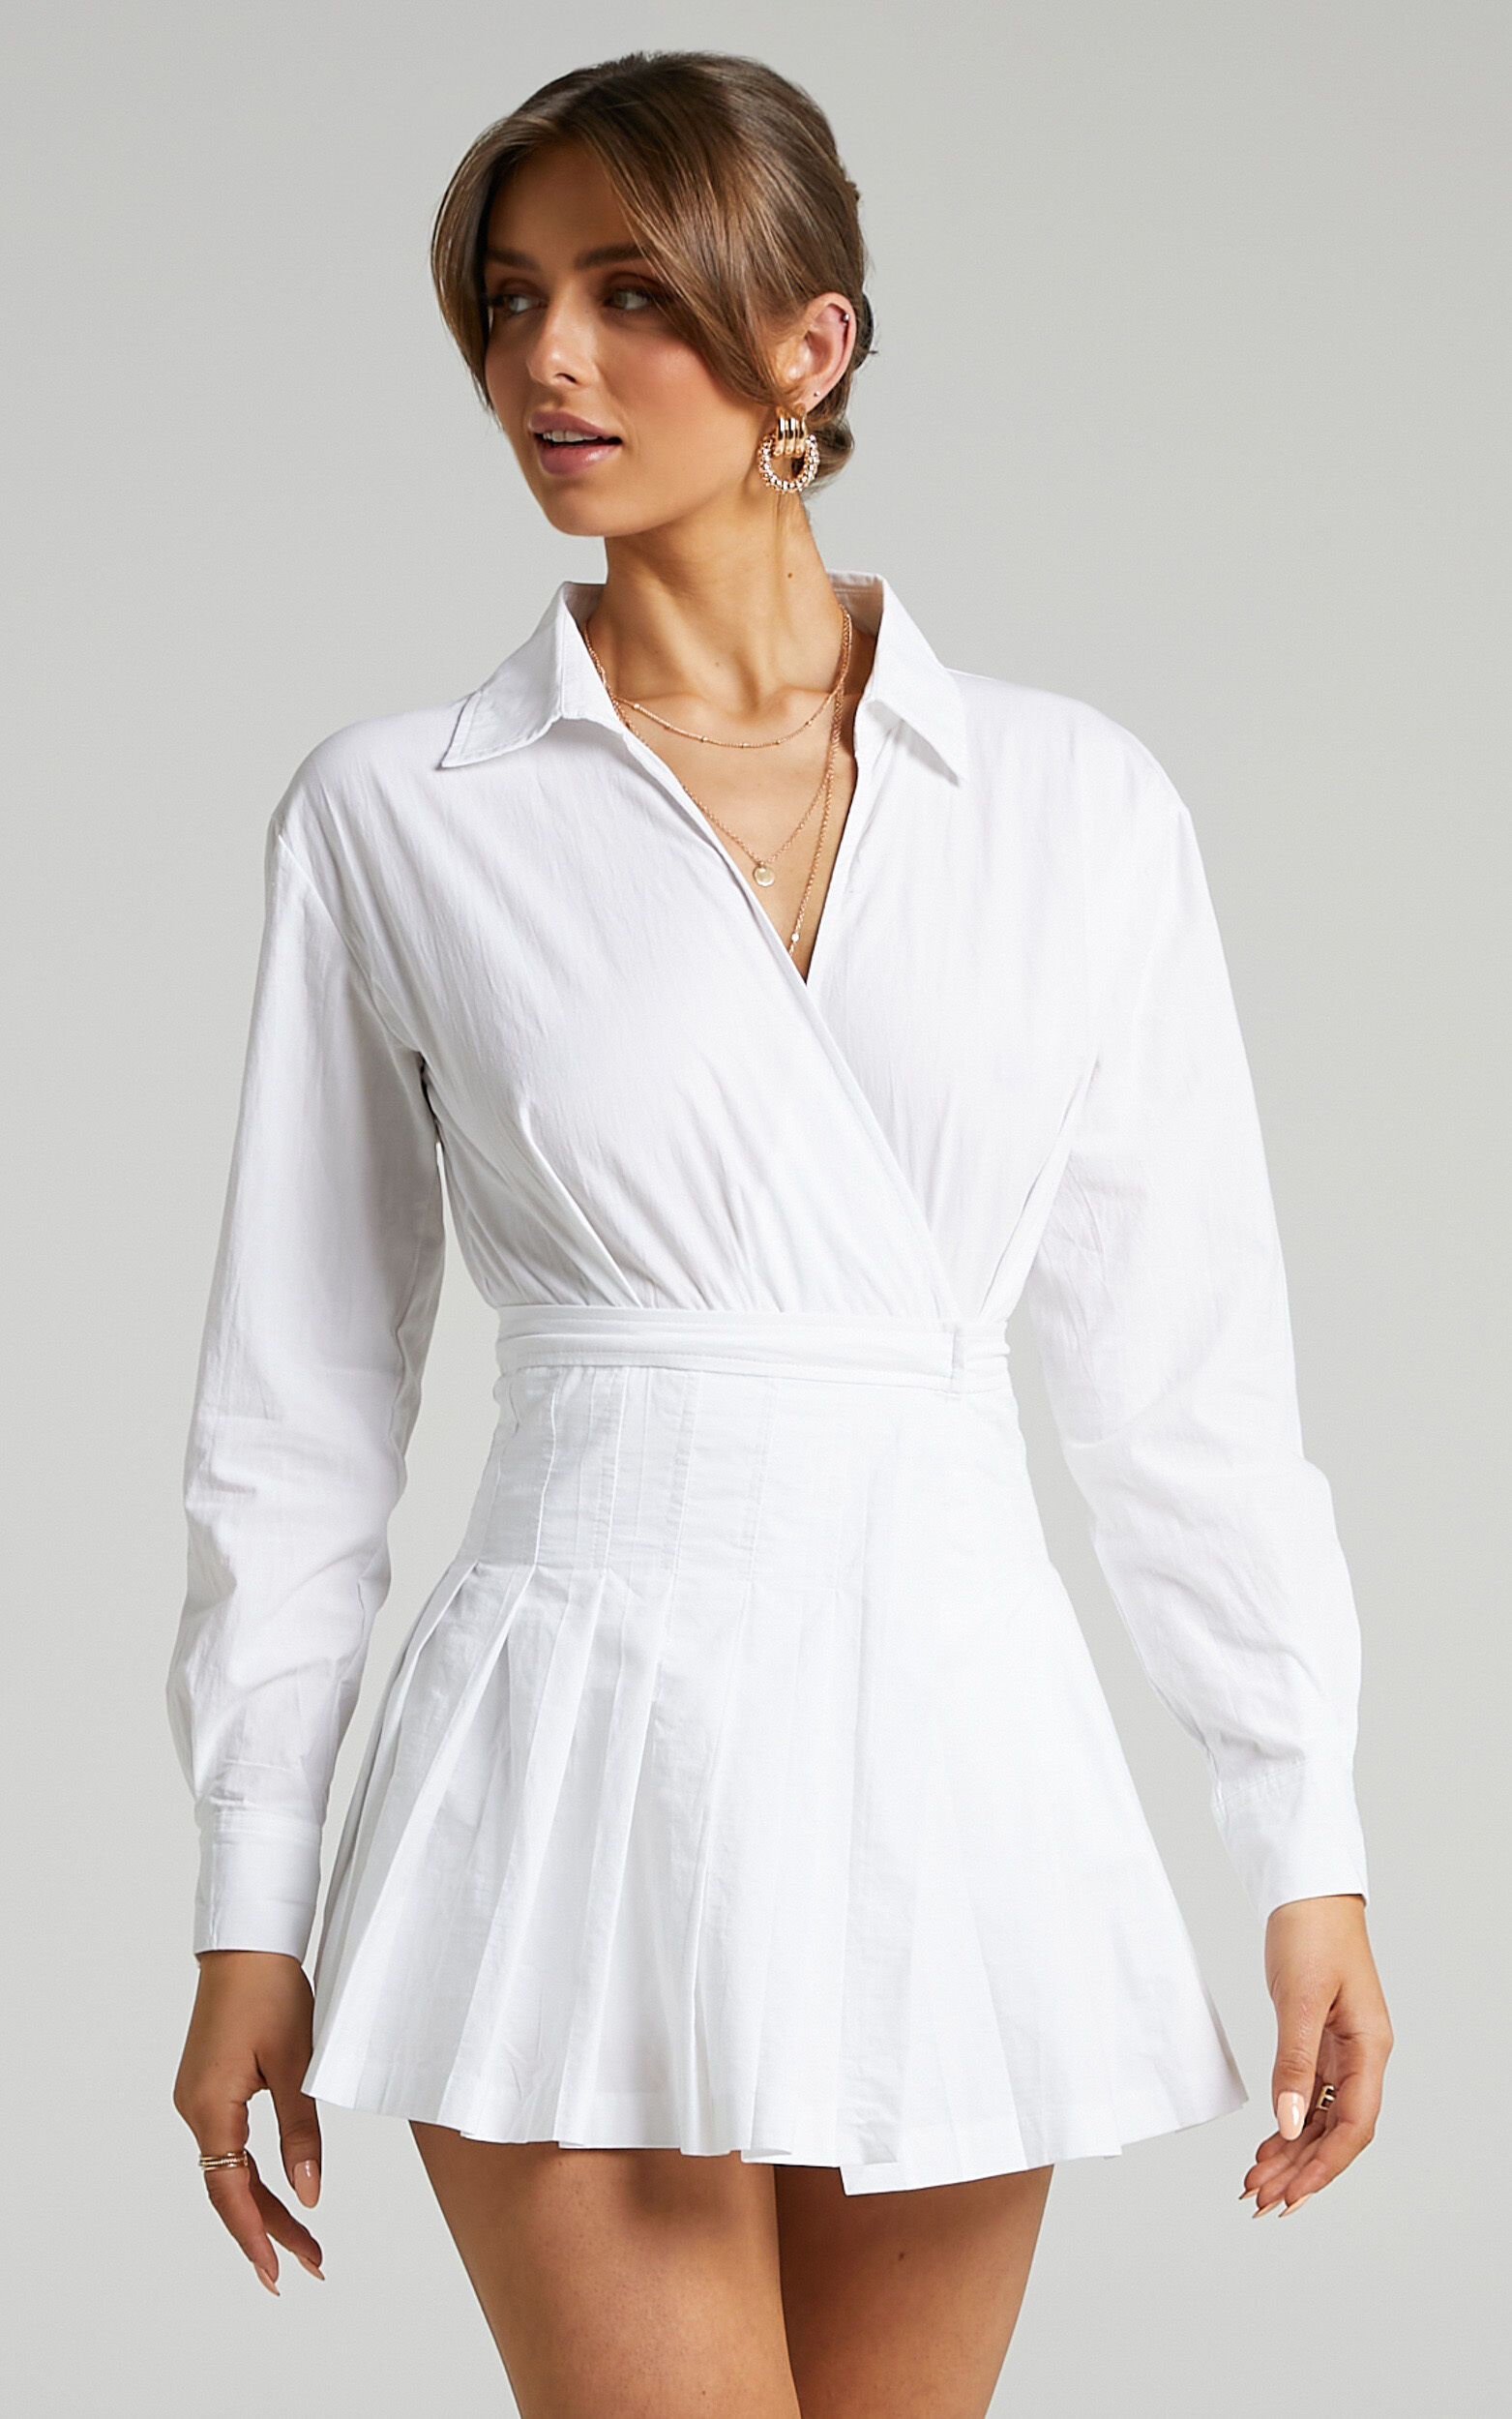 Pamella Tennis Skirt Playsuit in White - 06, WHT1, super-hi-res image number null